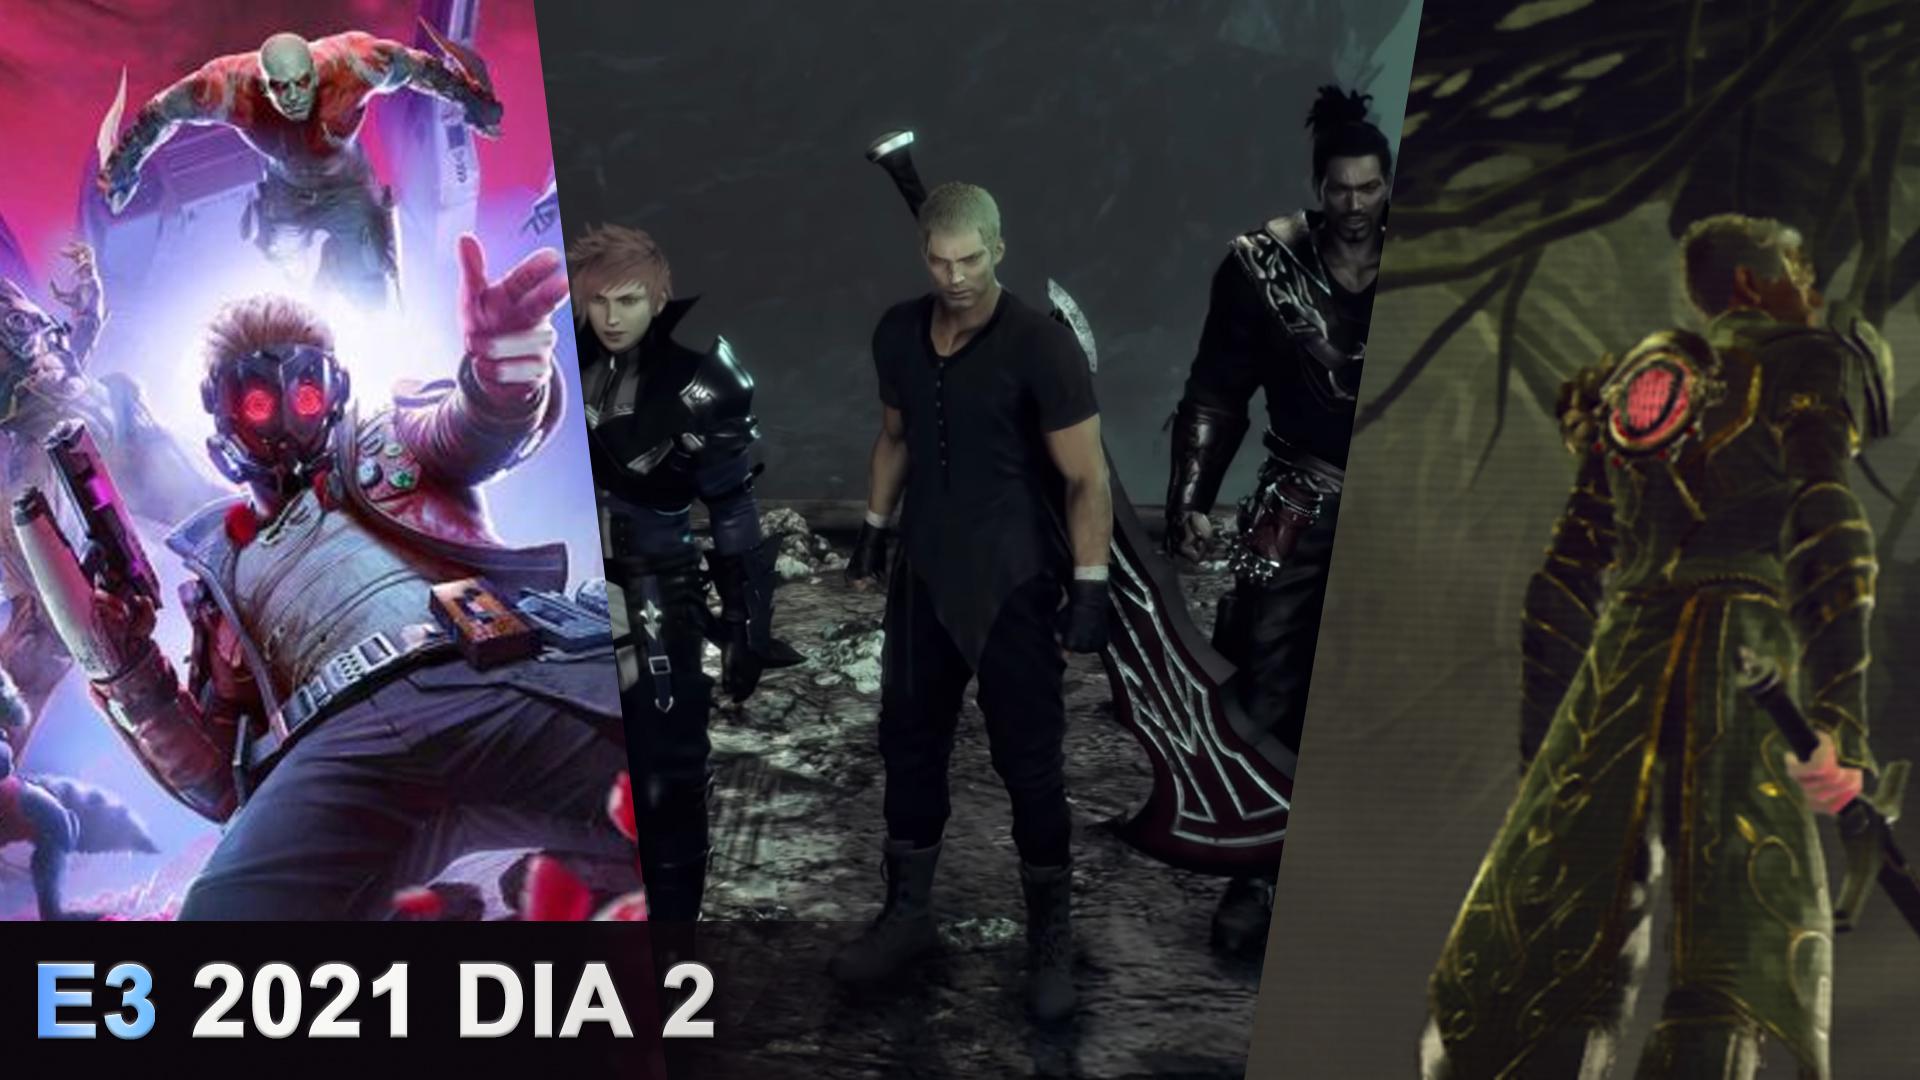 Super resumen del día 2 del E3-2021